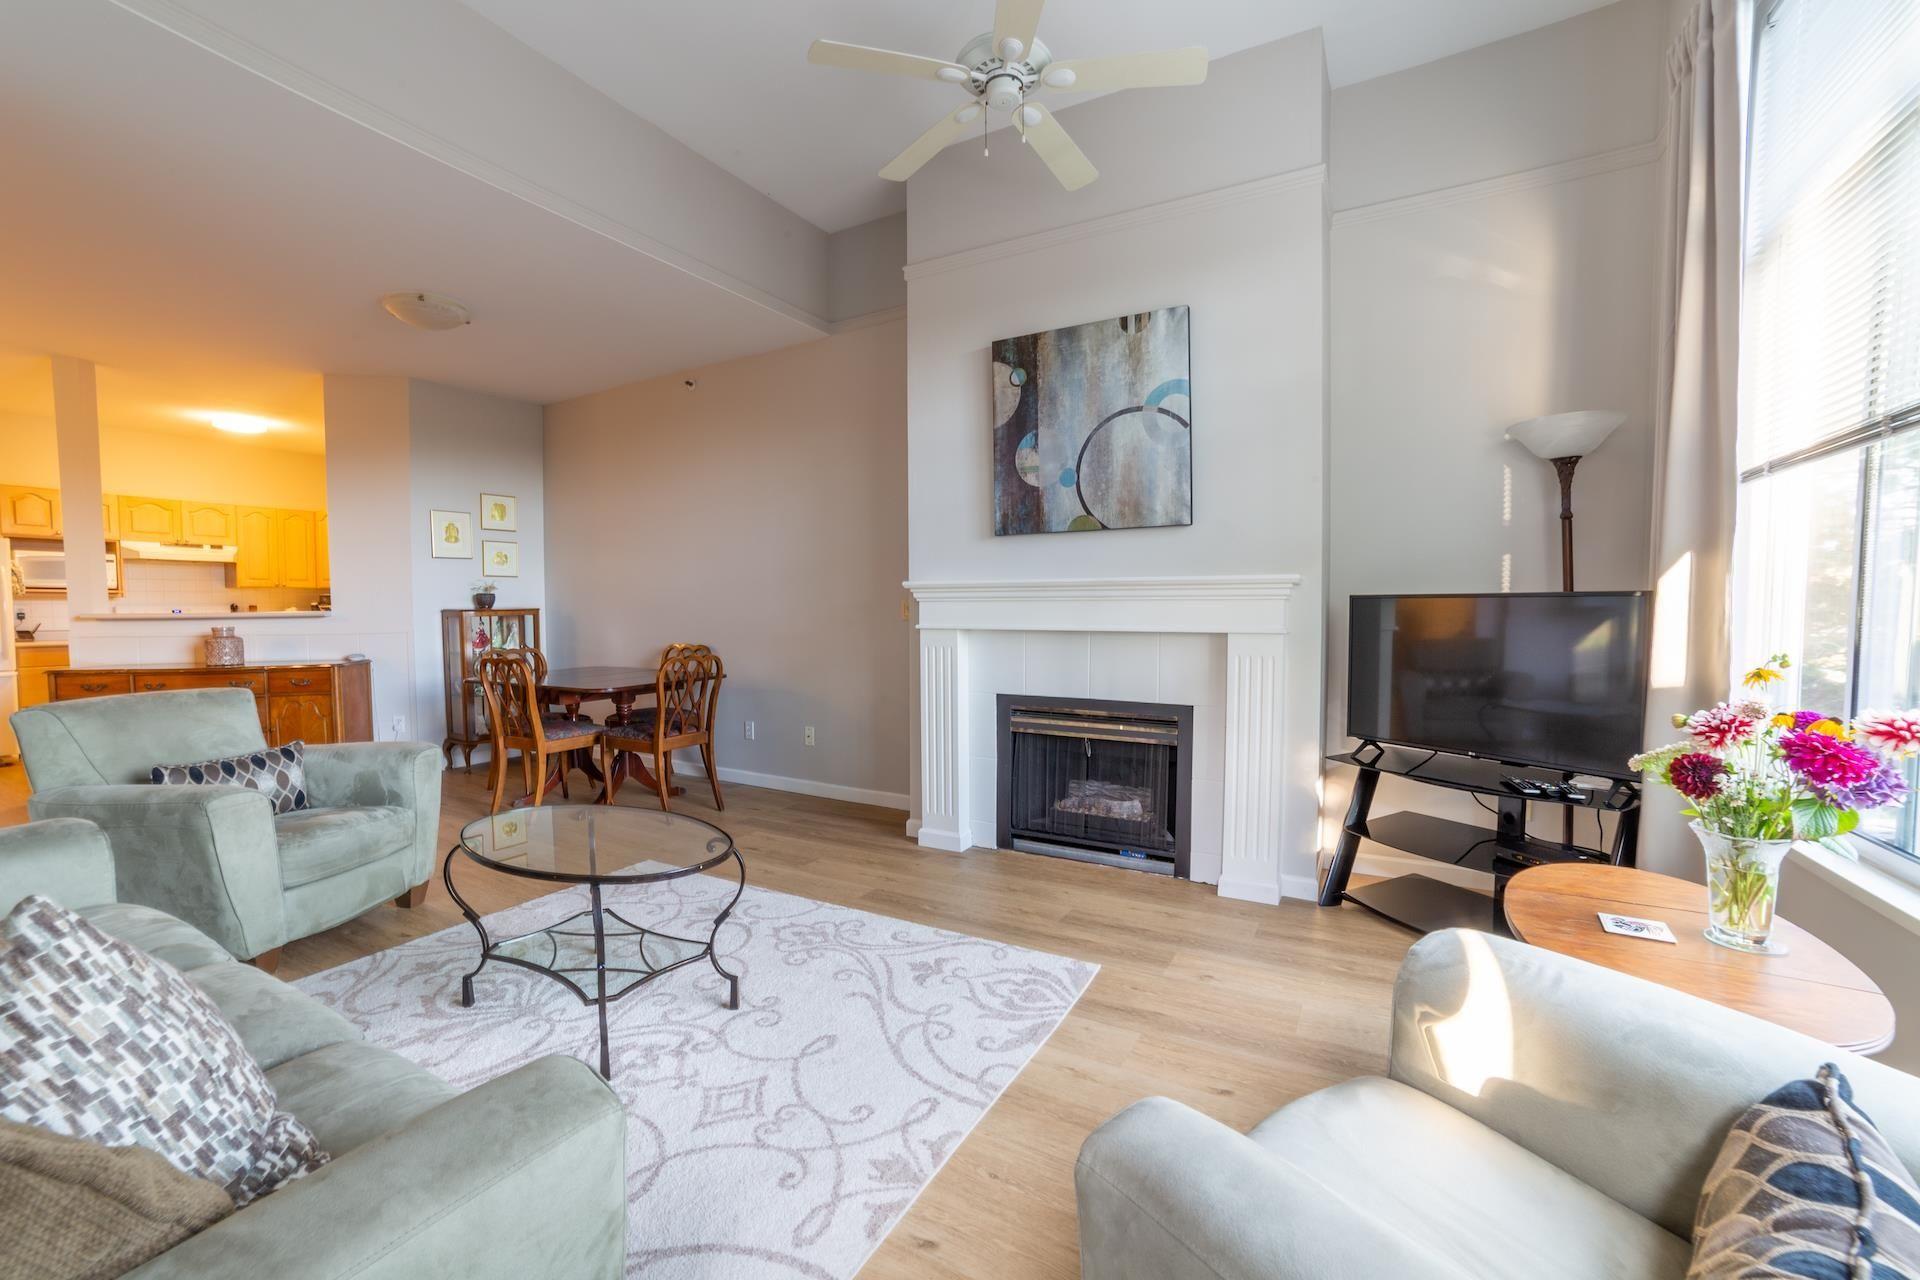 "Main Photo: 302 1153 54A Street in Delta: Tsawwassen Central Condo for sale in ""HERON PLAC3"" (Tsawwassen)  : MLS®# R2617835"